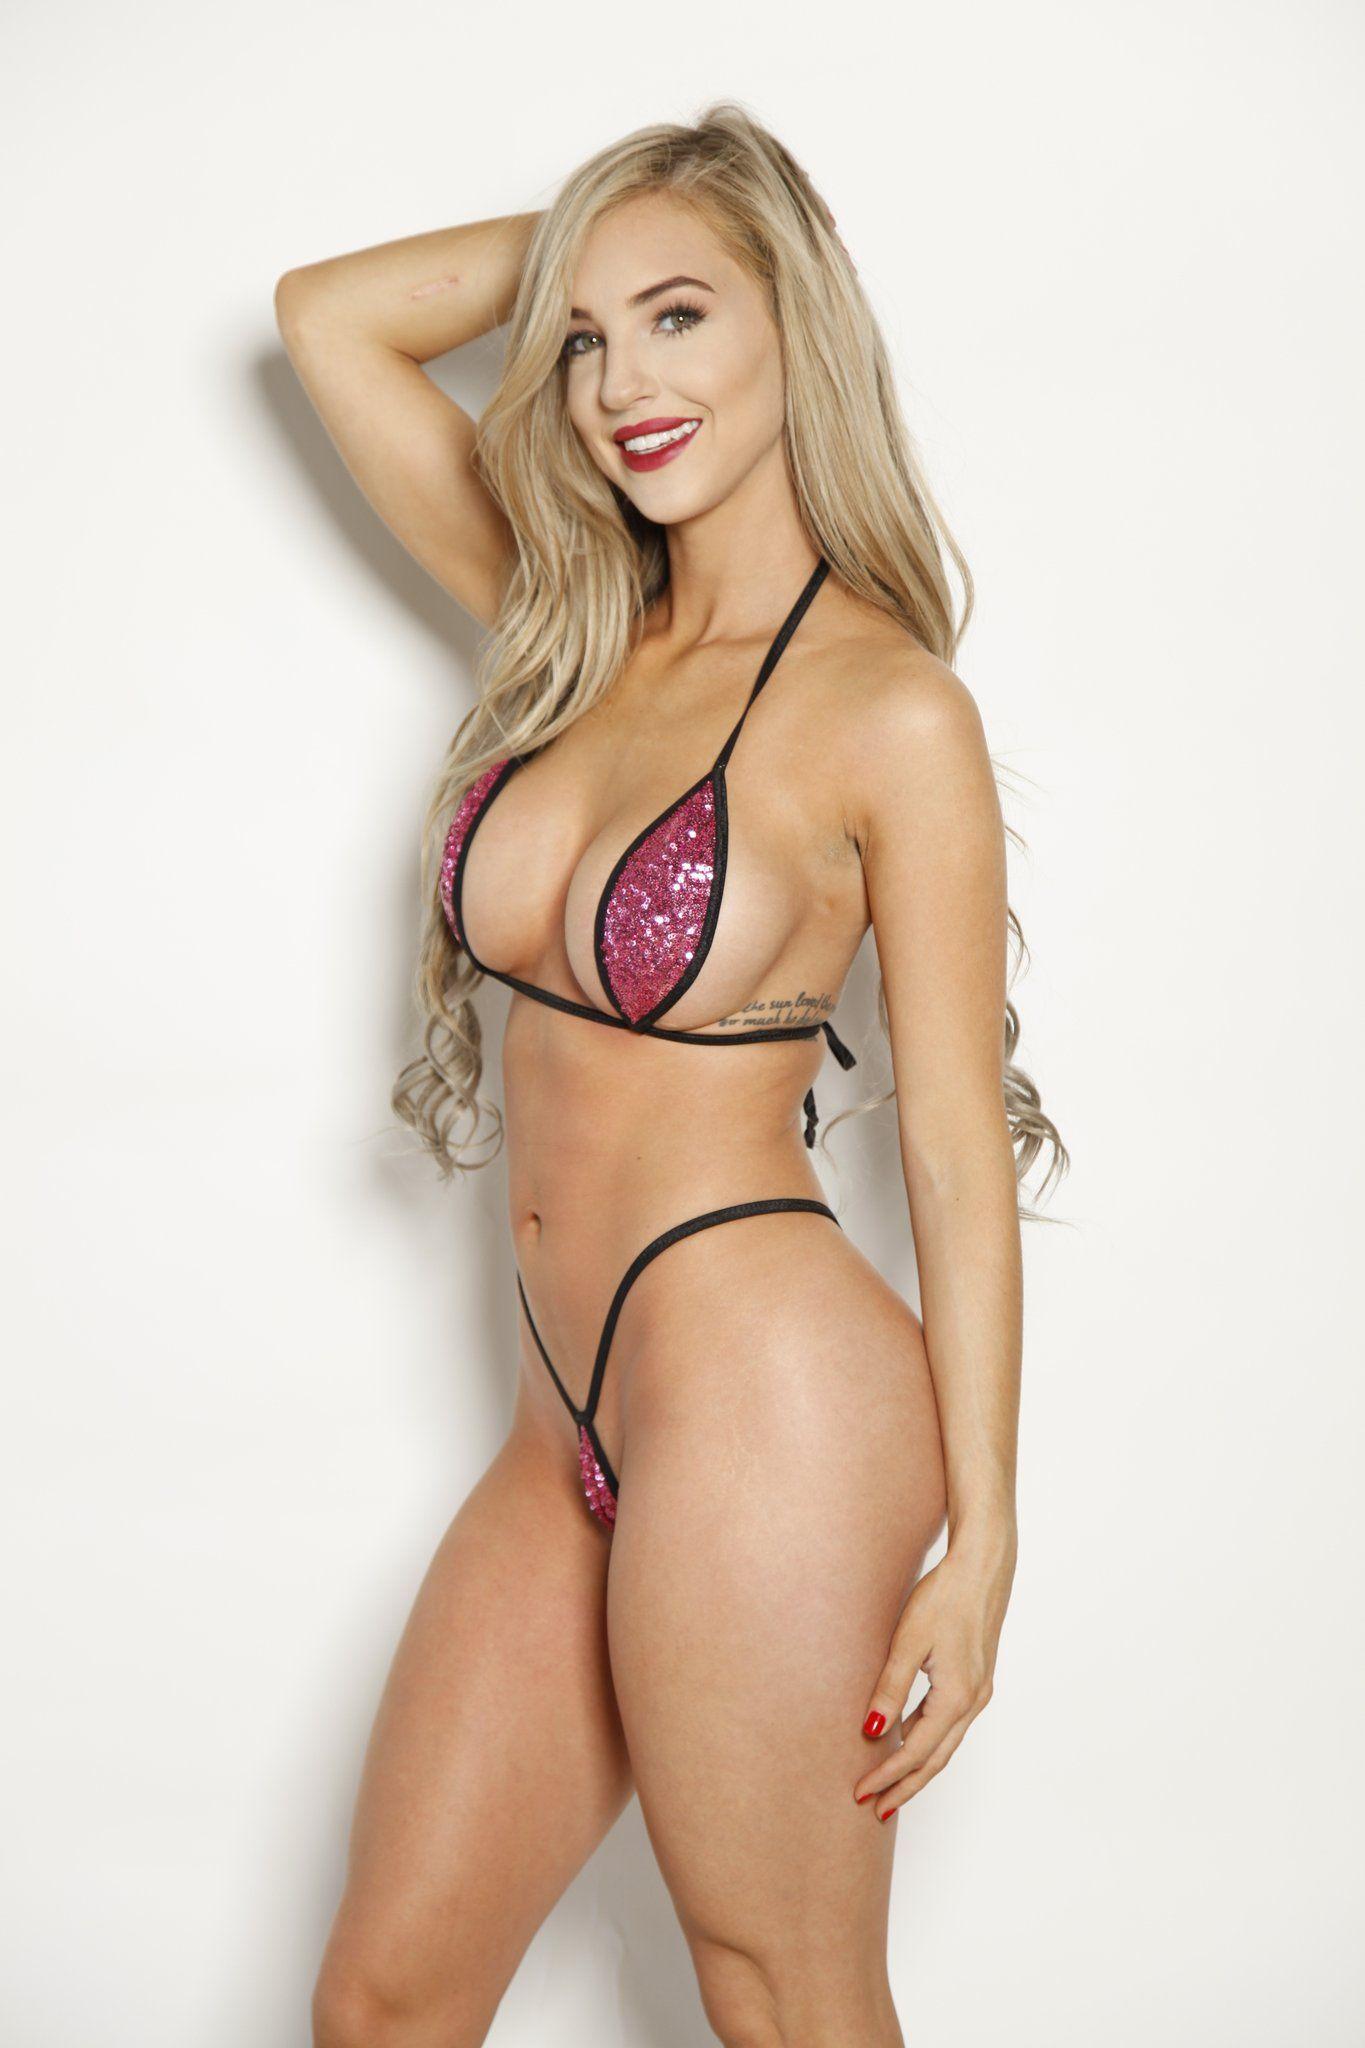 8fbd88846f52d Bitsy s Bikinis Pink Sequin Black String Extreme Micro Teardrop Bikini Shop  Sparkly Swimwear Online!